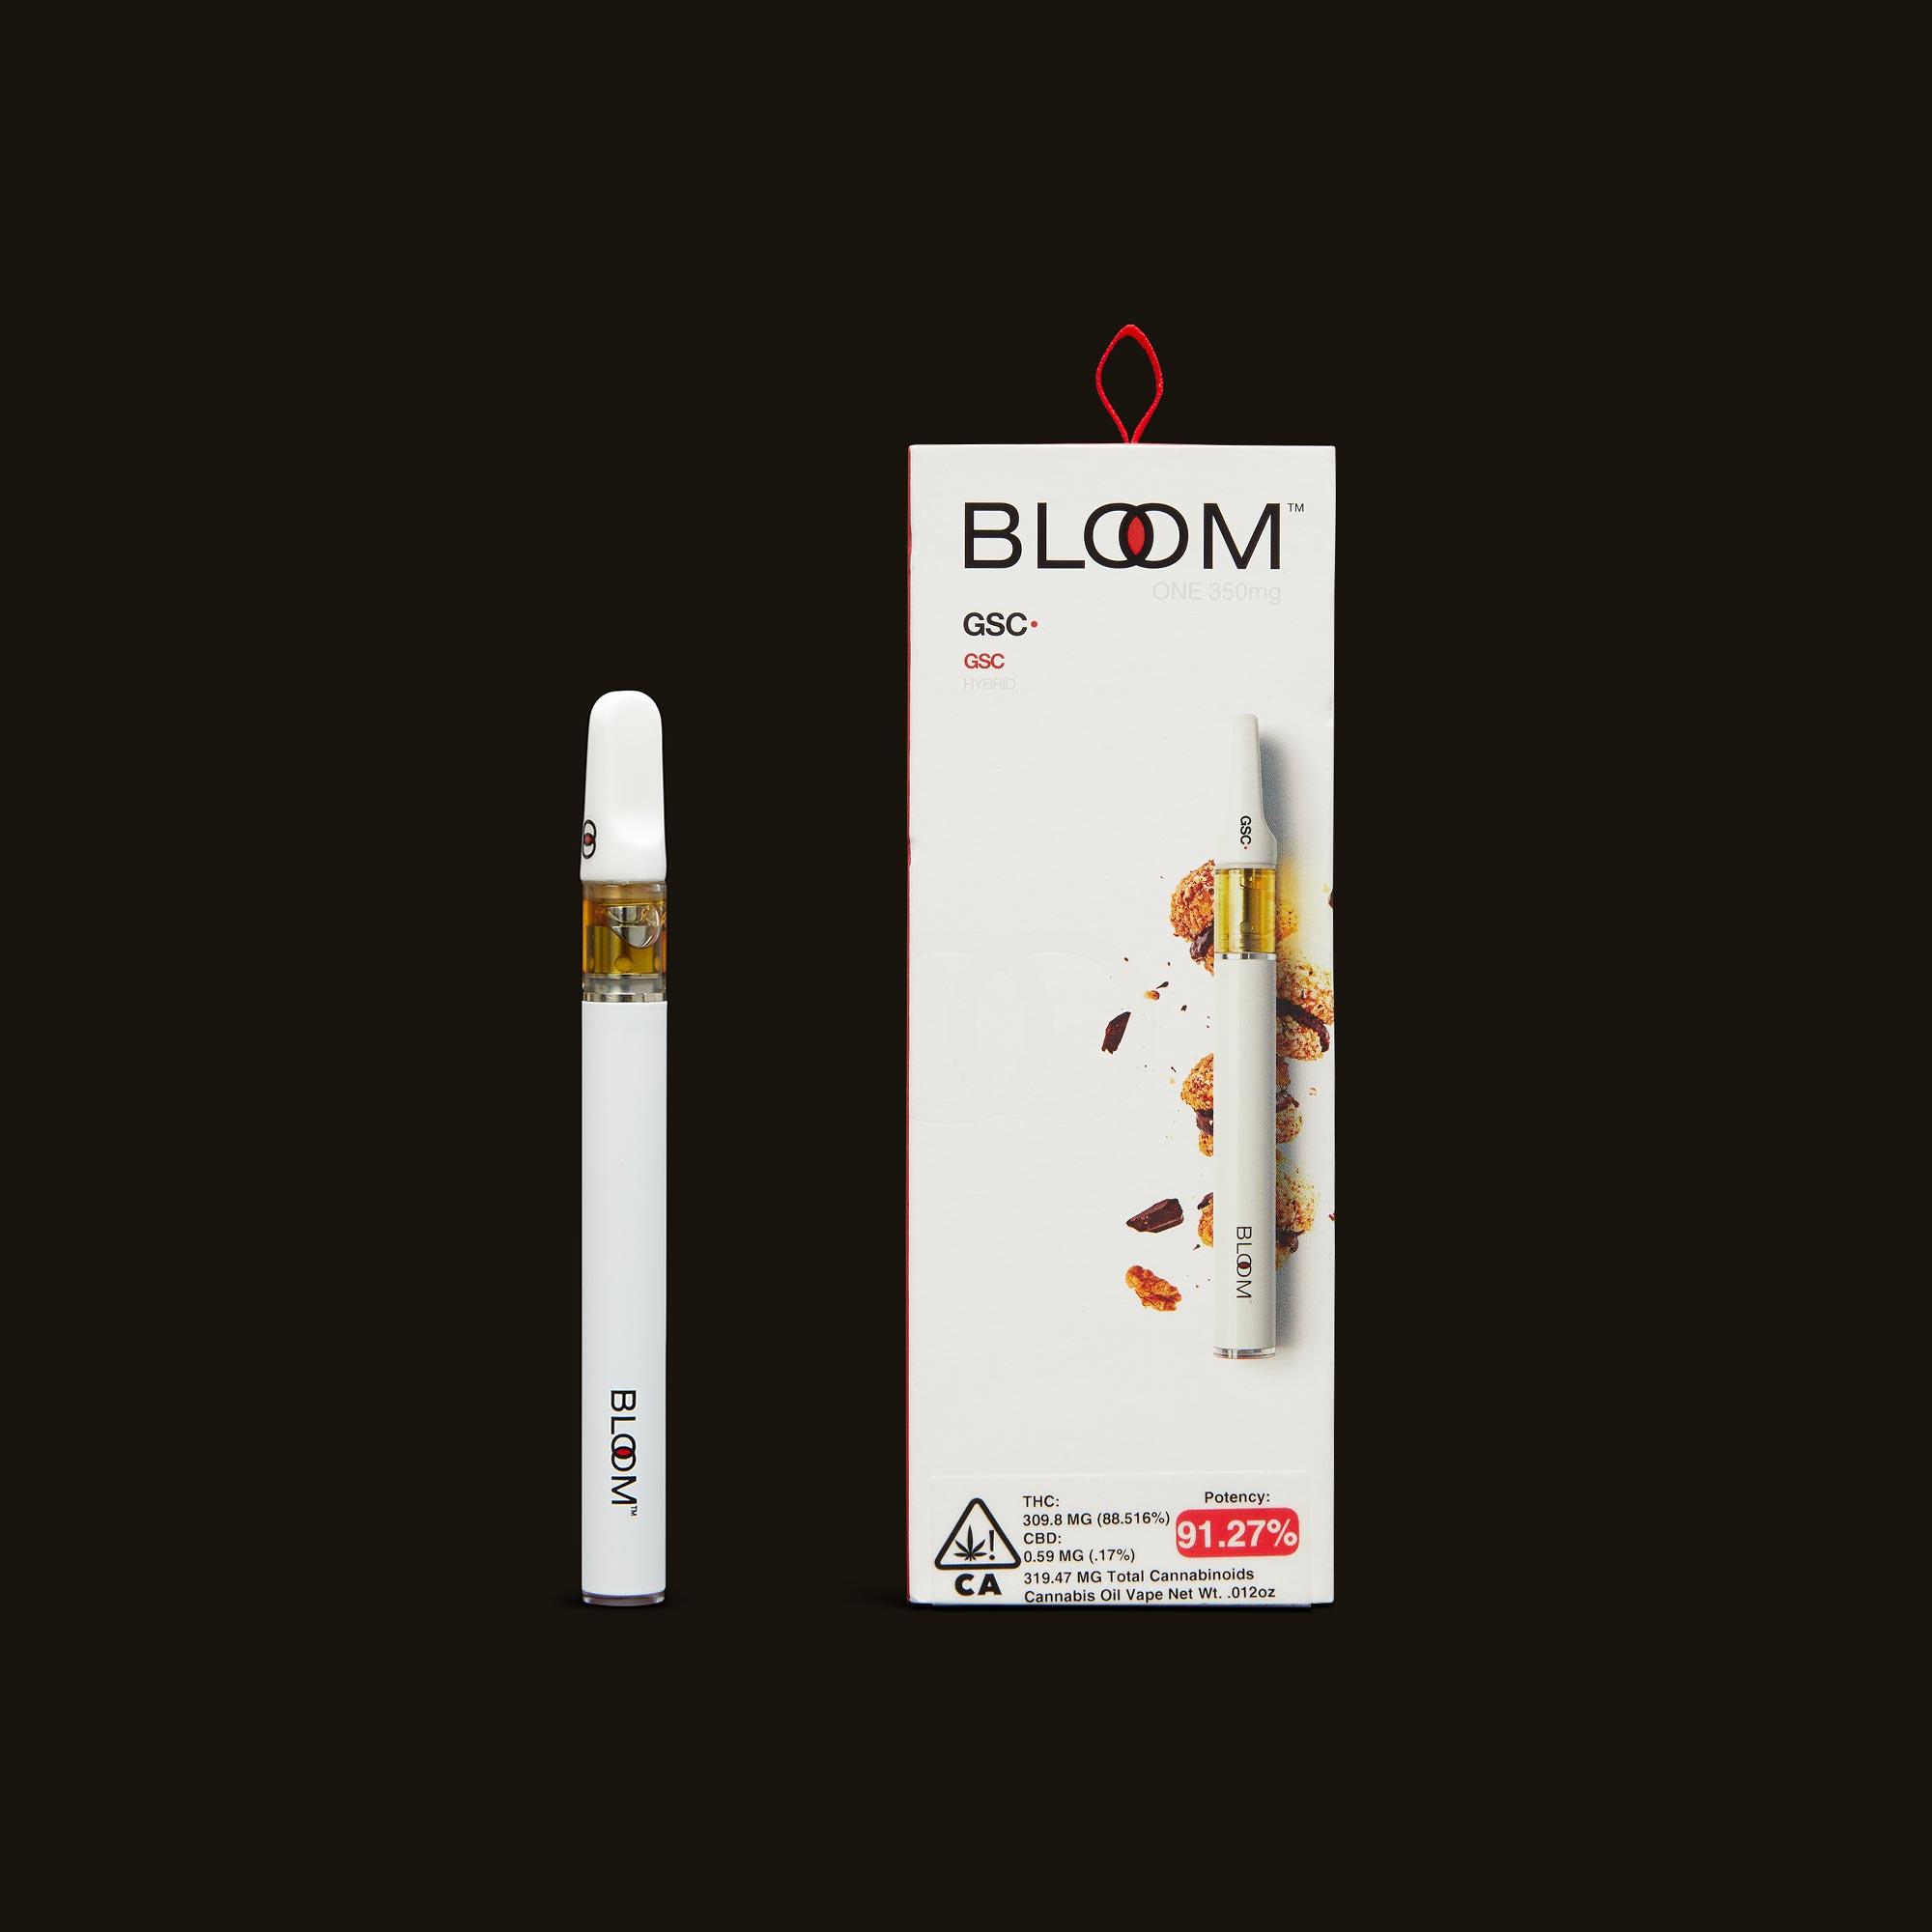 Bloom Brands GSC Bloom One